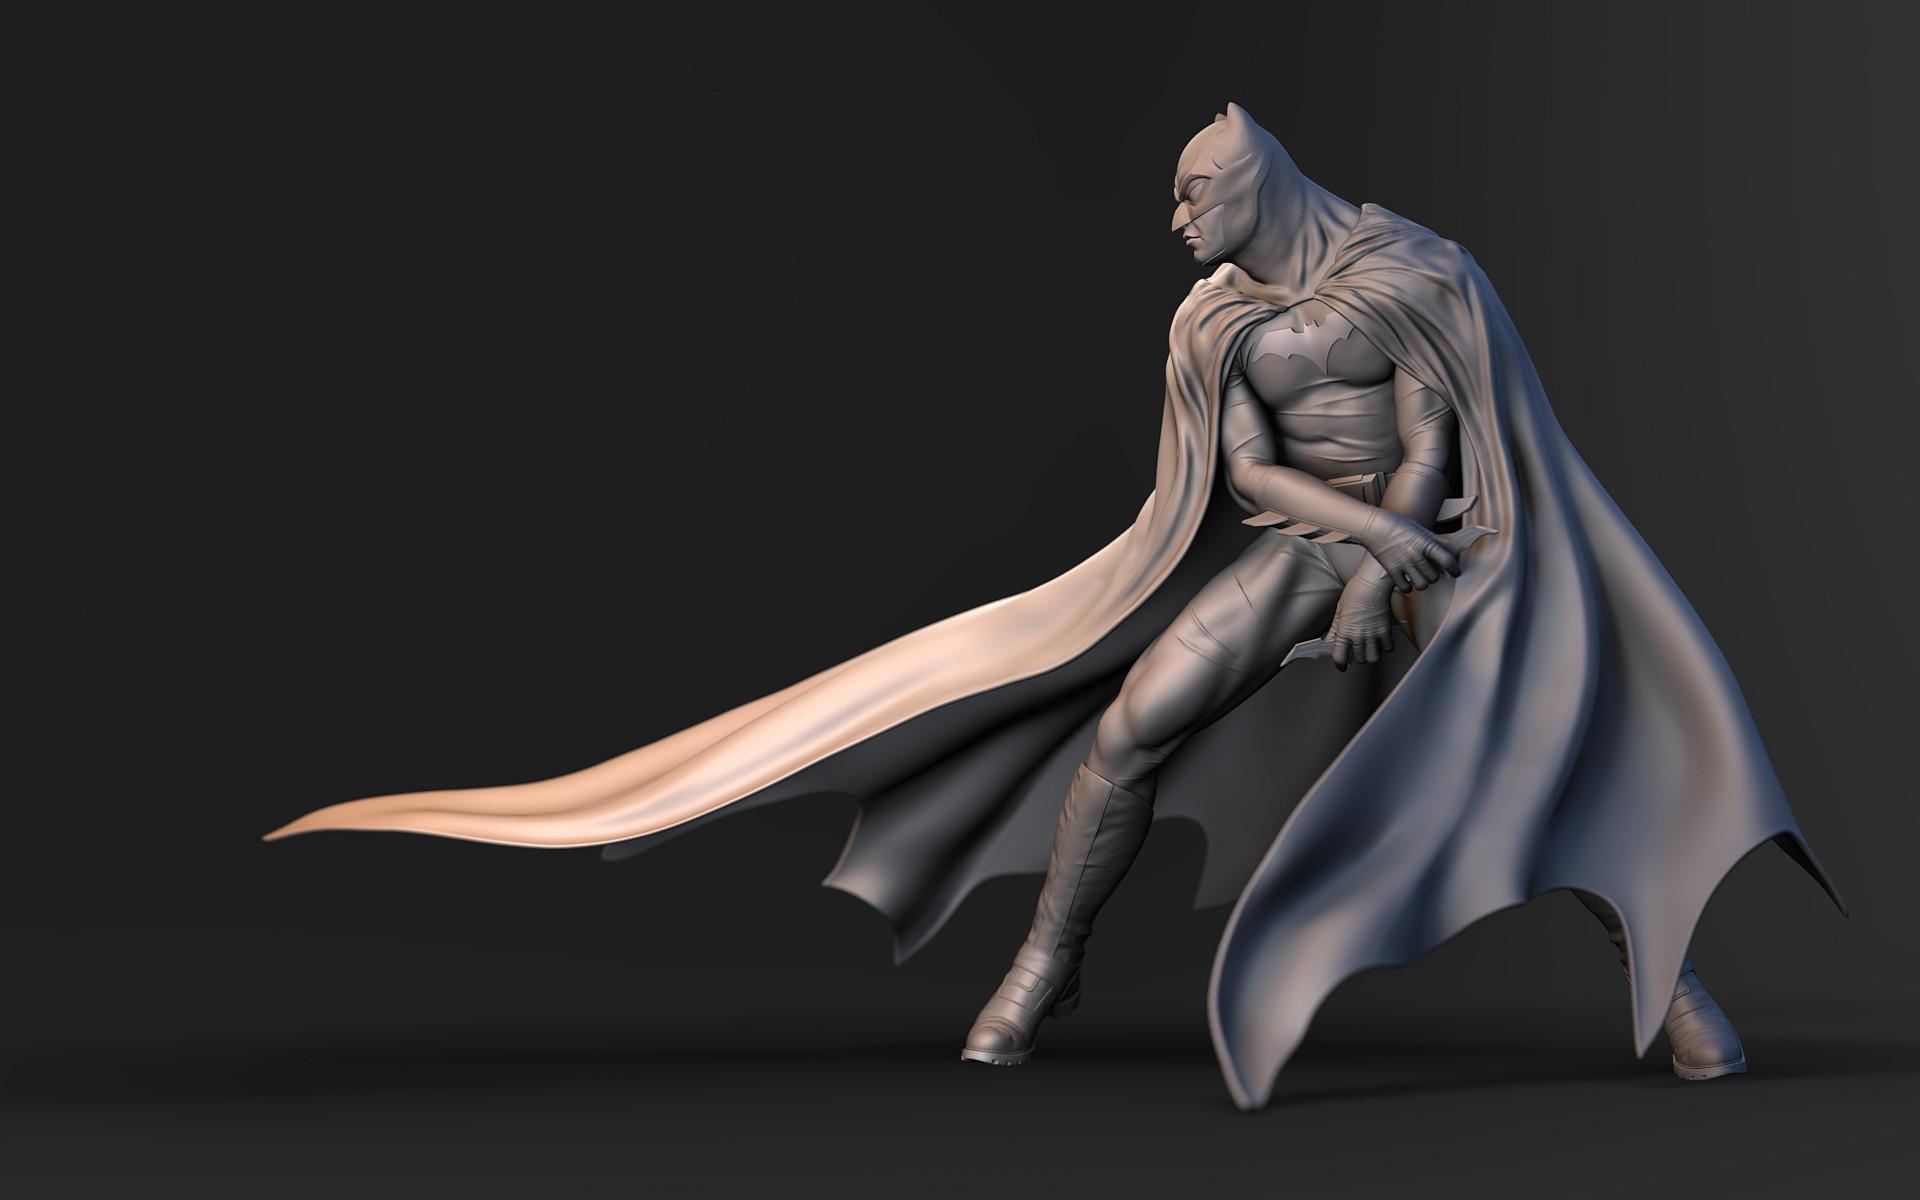 Leon teoh bat keyshot 18